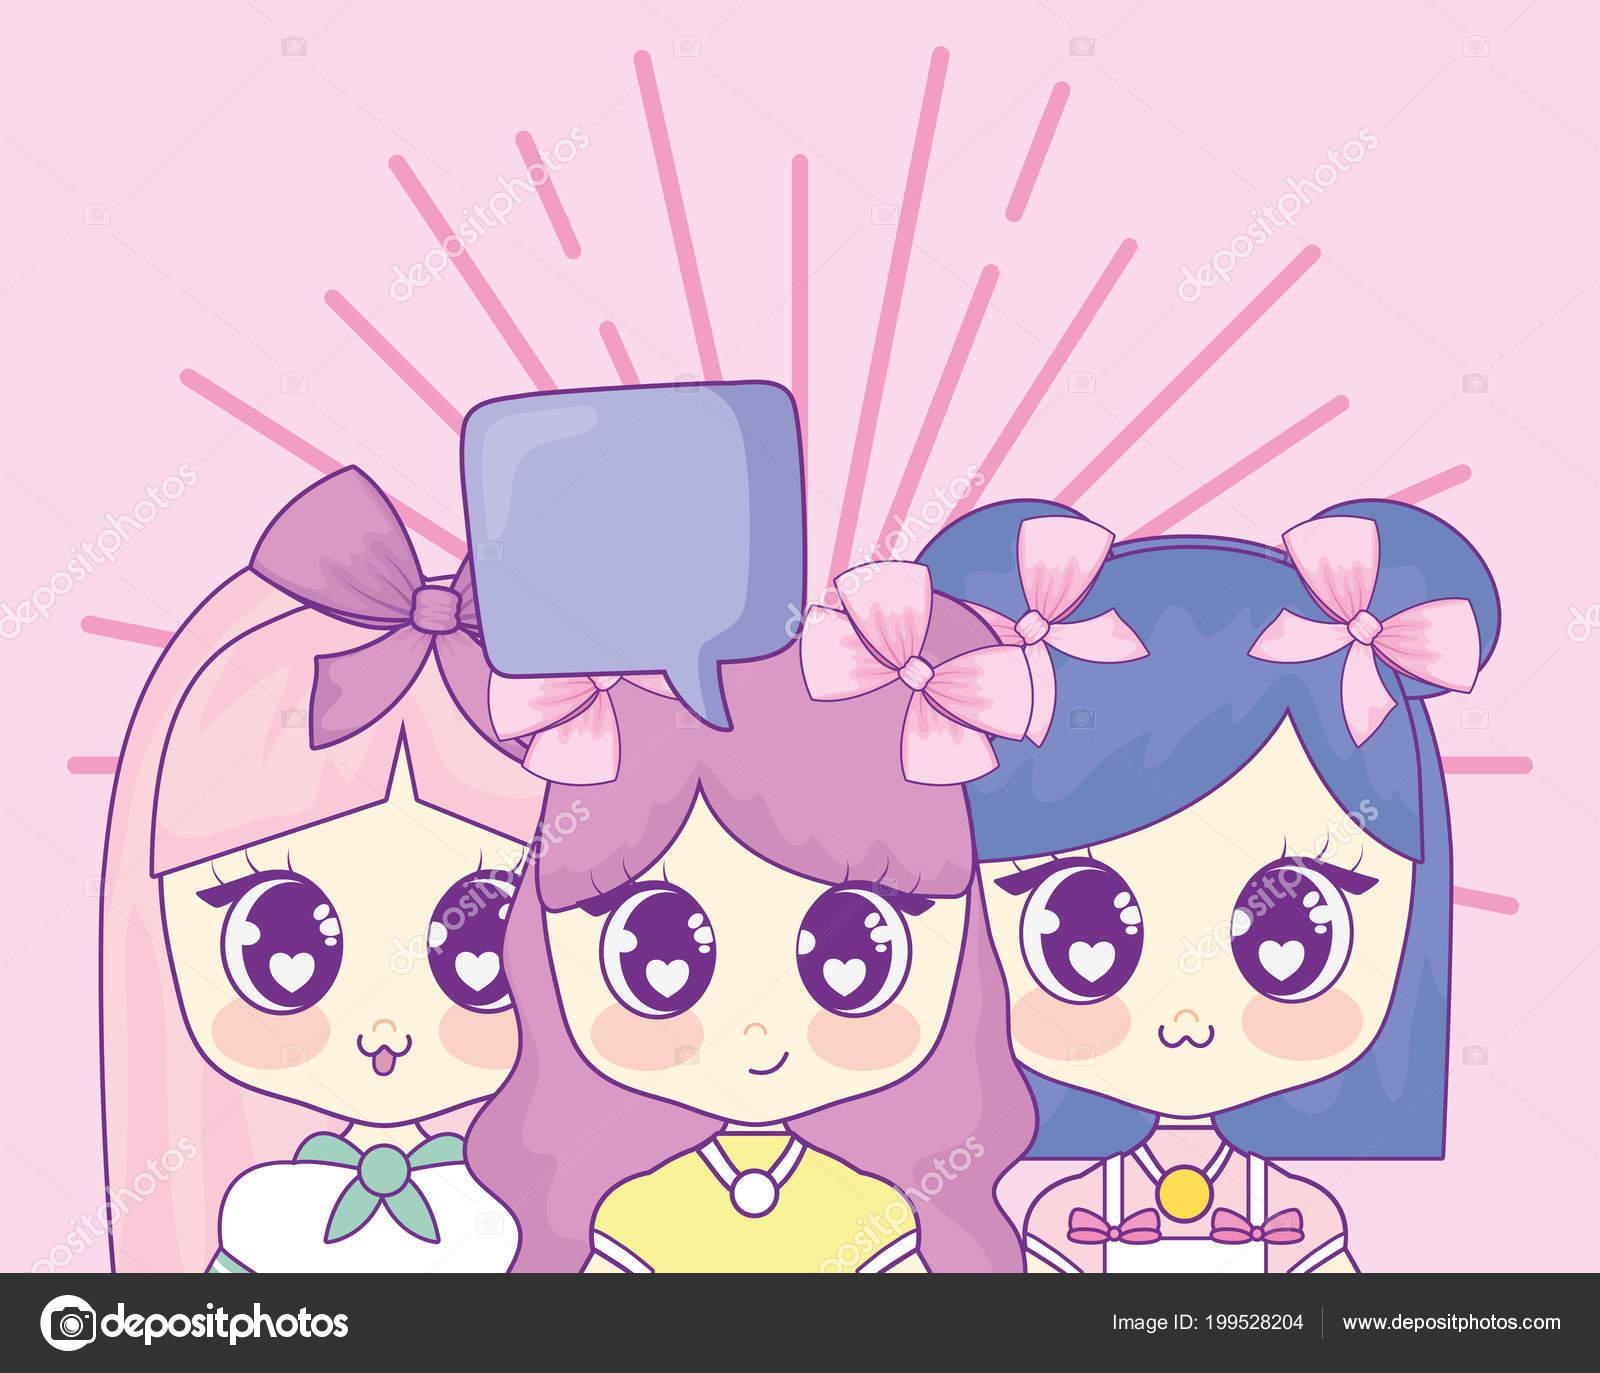 kawaii anime girl design — stock vector © djv #199528204